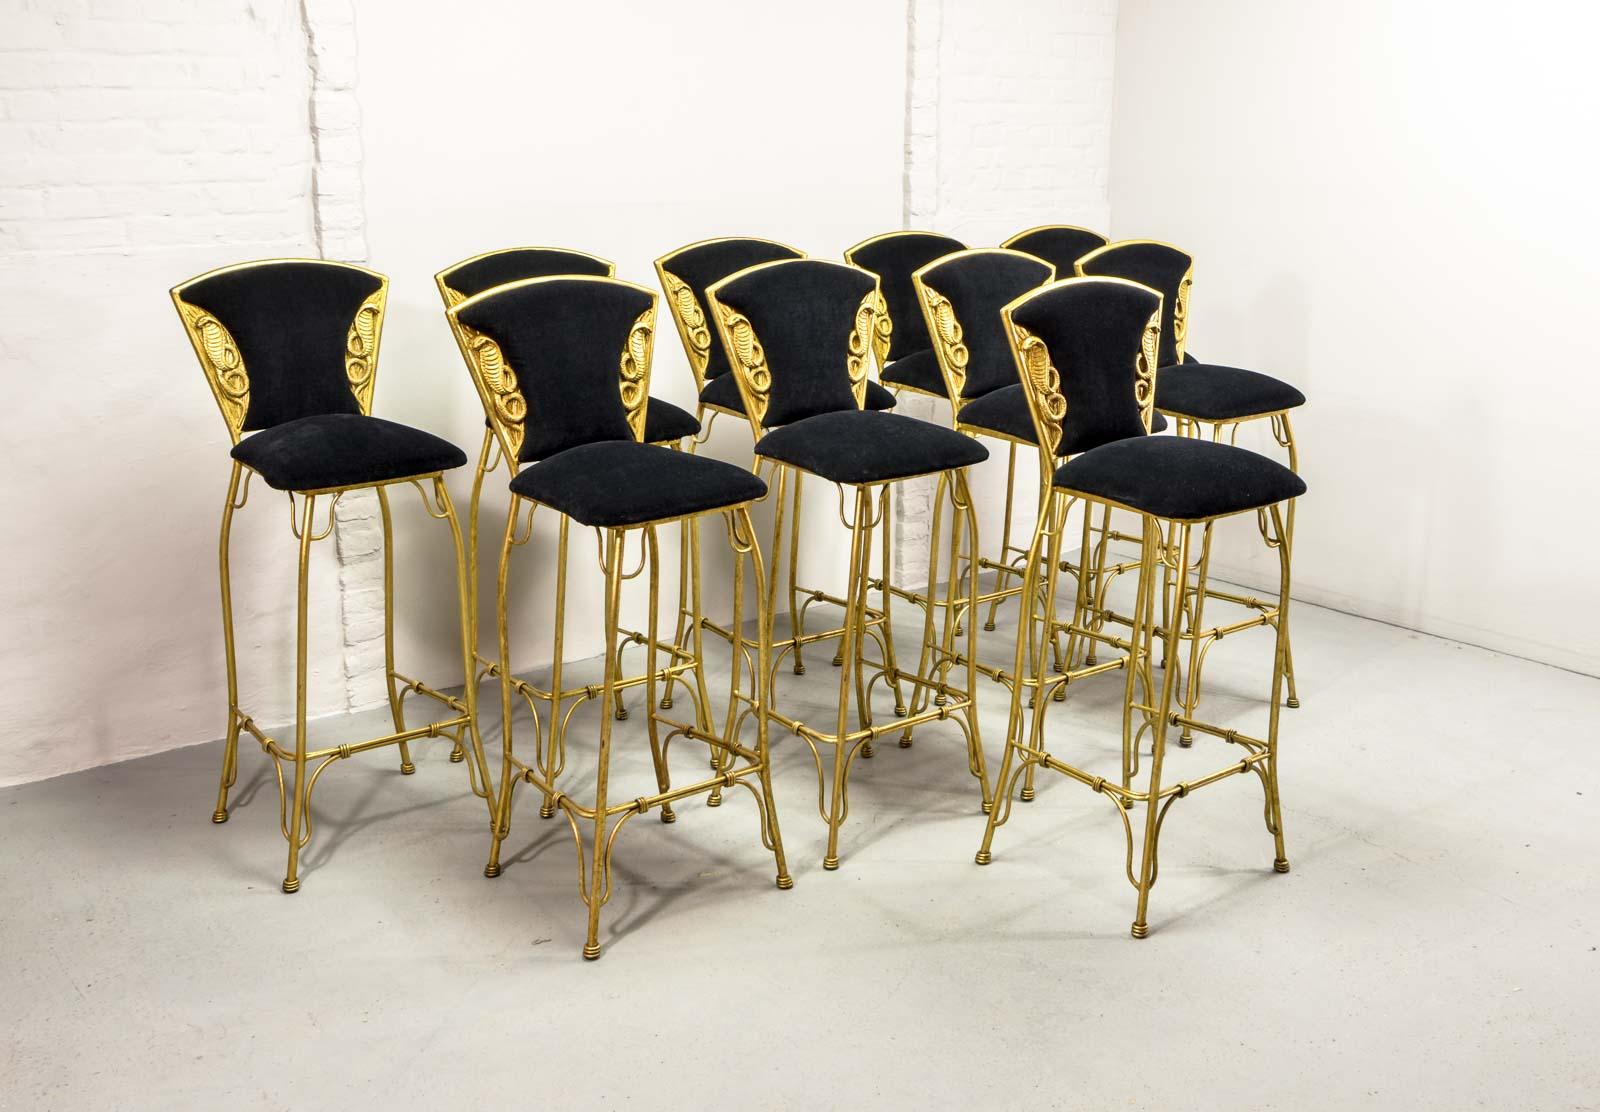 mid-century set of 10 gilded cobra bar stools | hpvintage 1970s Bar Stools